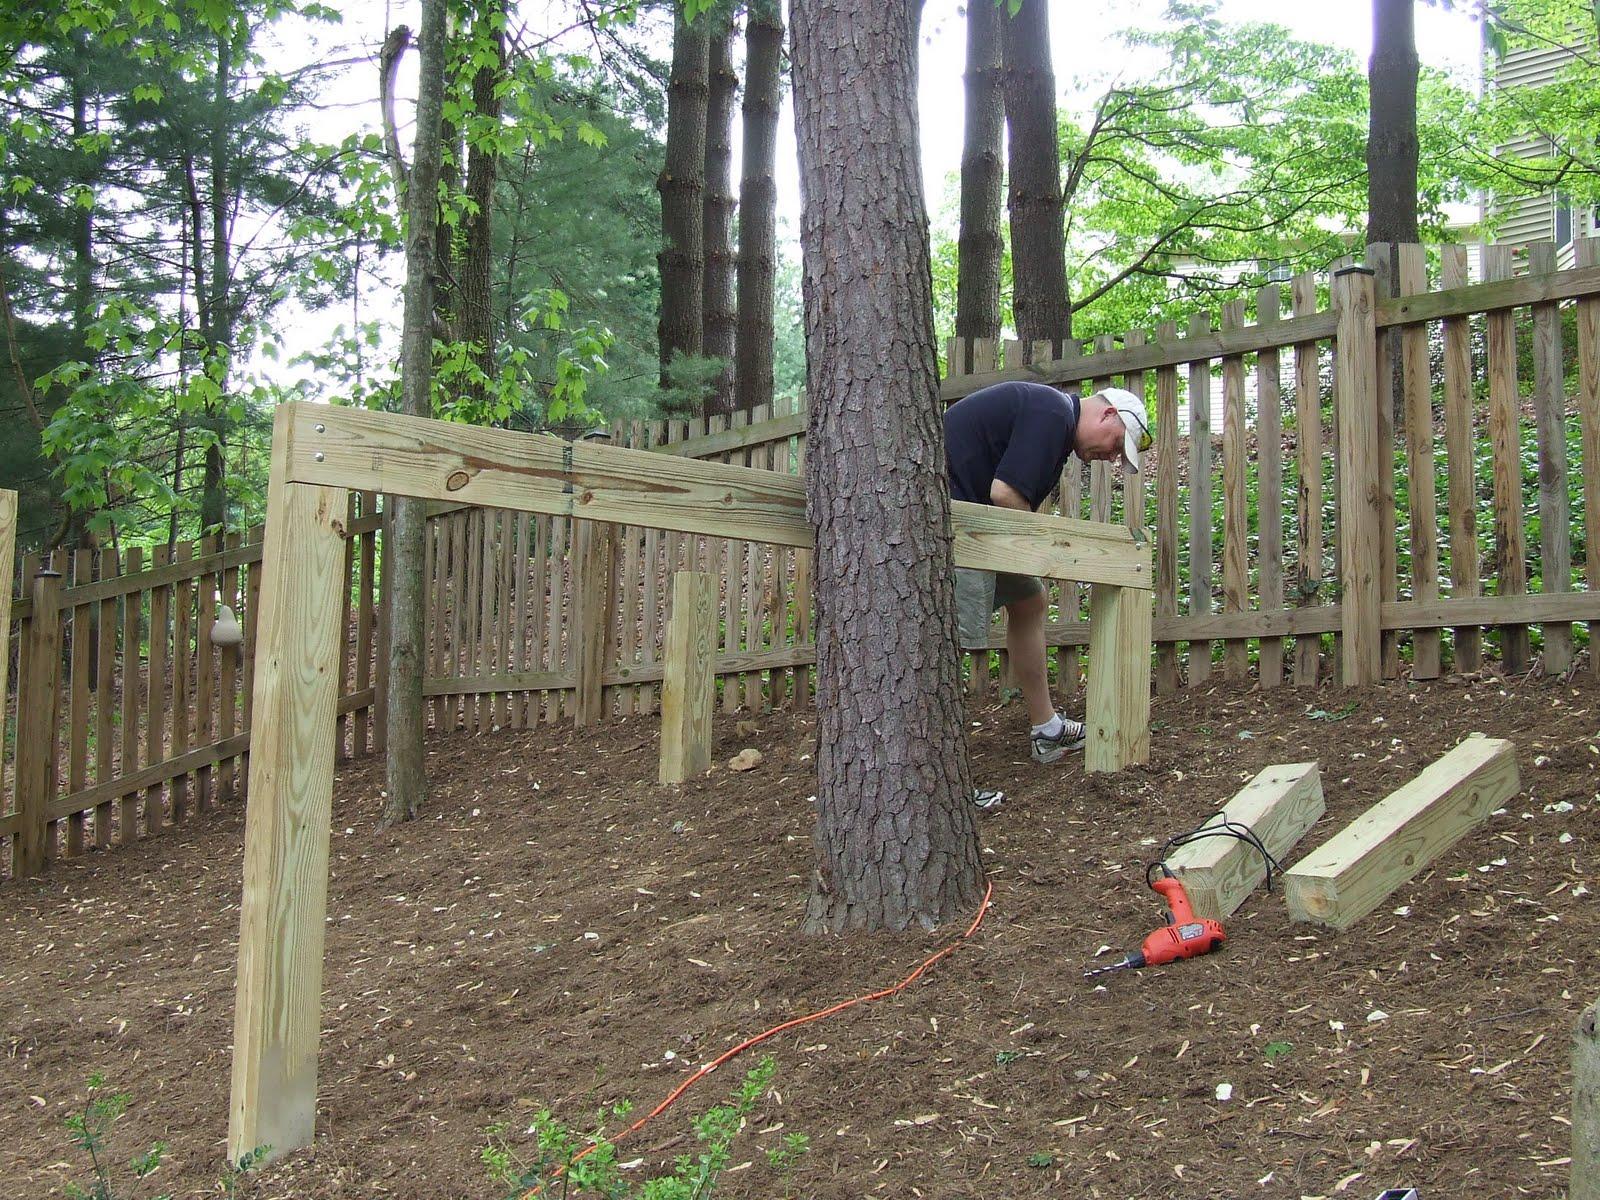 The Jones Tree House Project